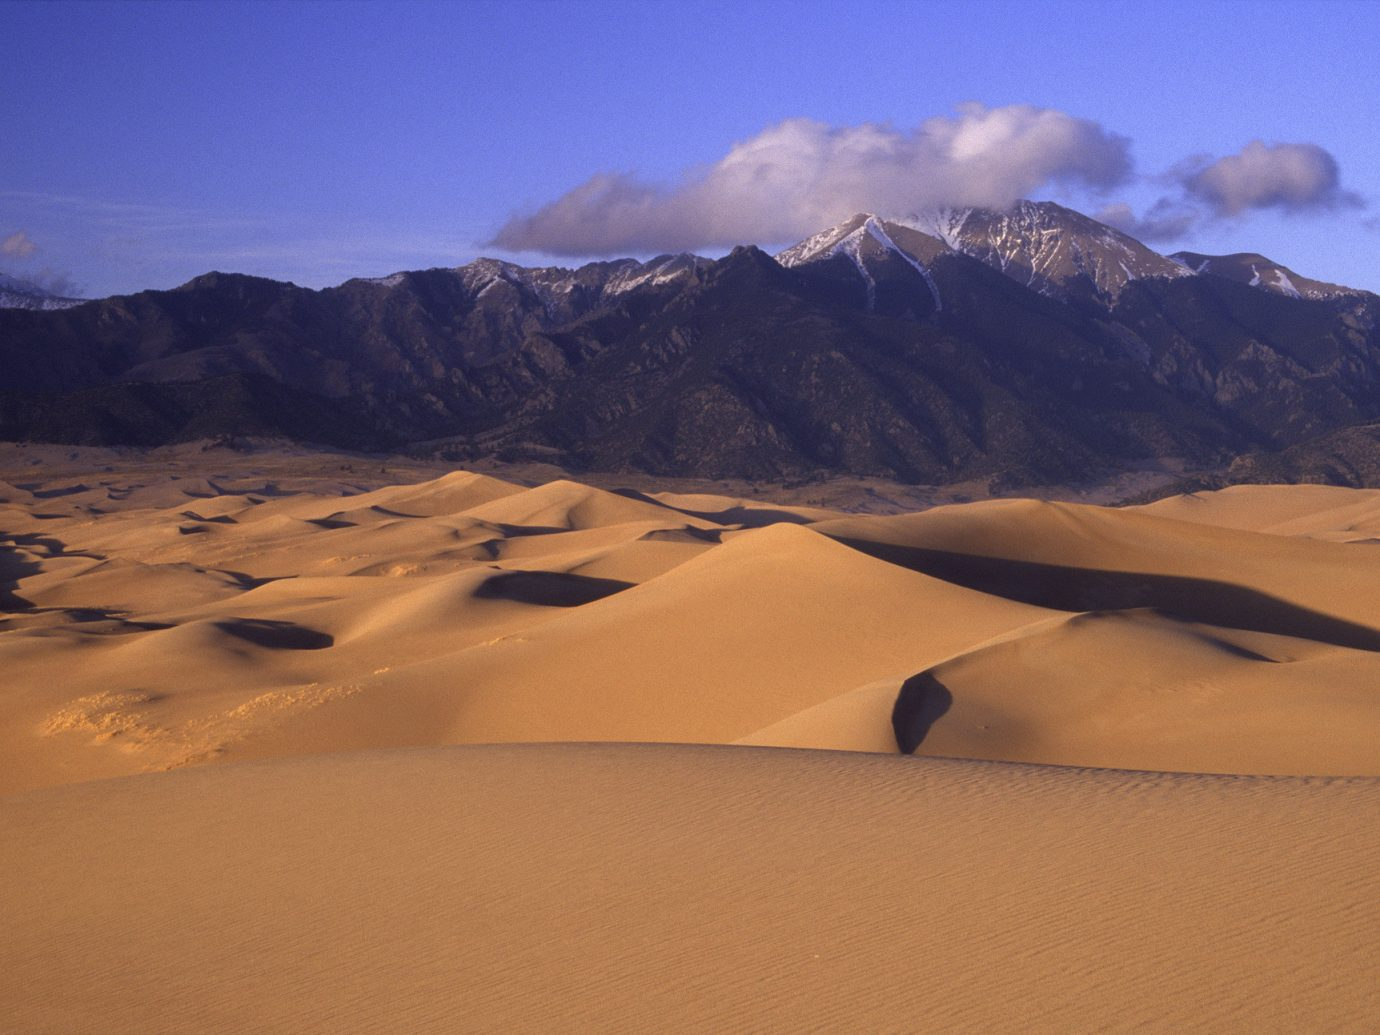 Trip Ideas mountain sky Nature habitat outdoor geographical feature natural environment landform erg aeolian landform landscape Desert sand sahara dune wadi plateau clouds